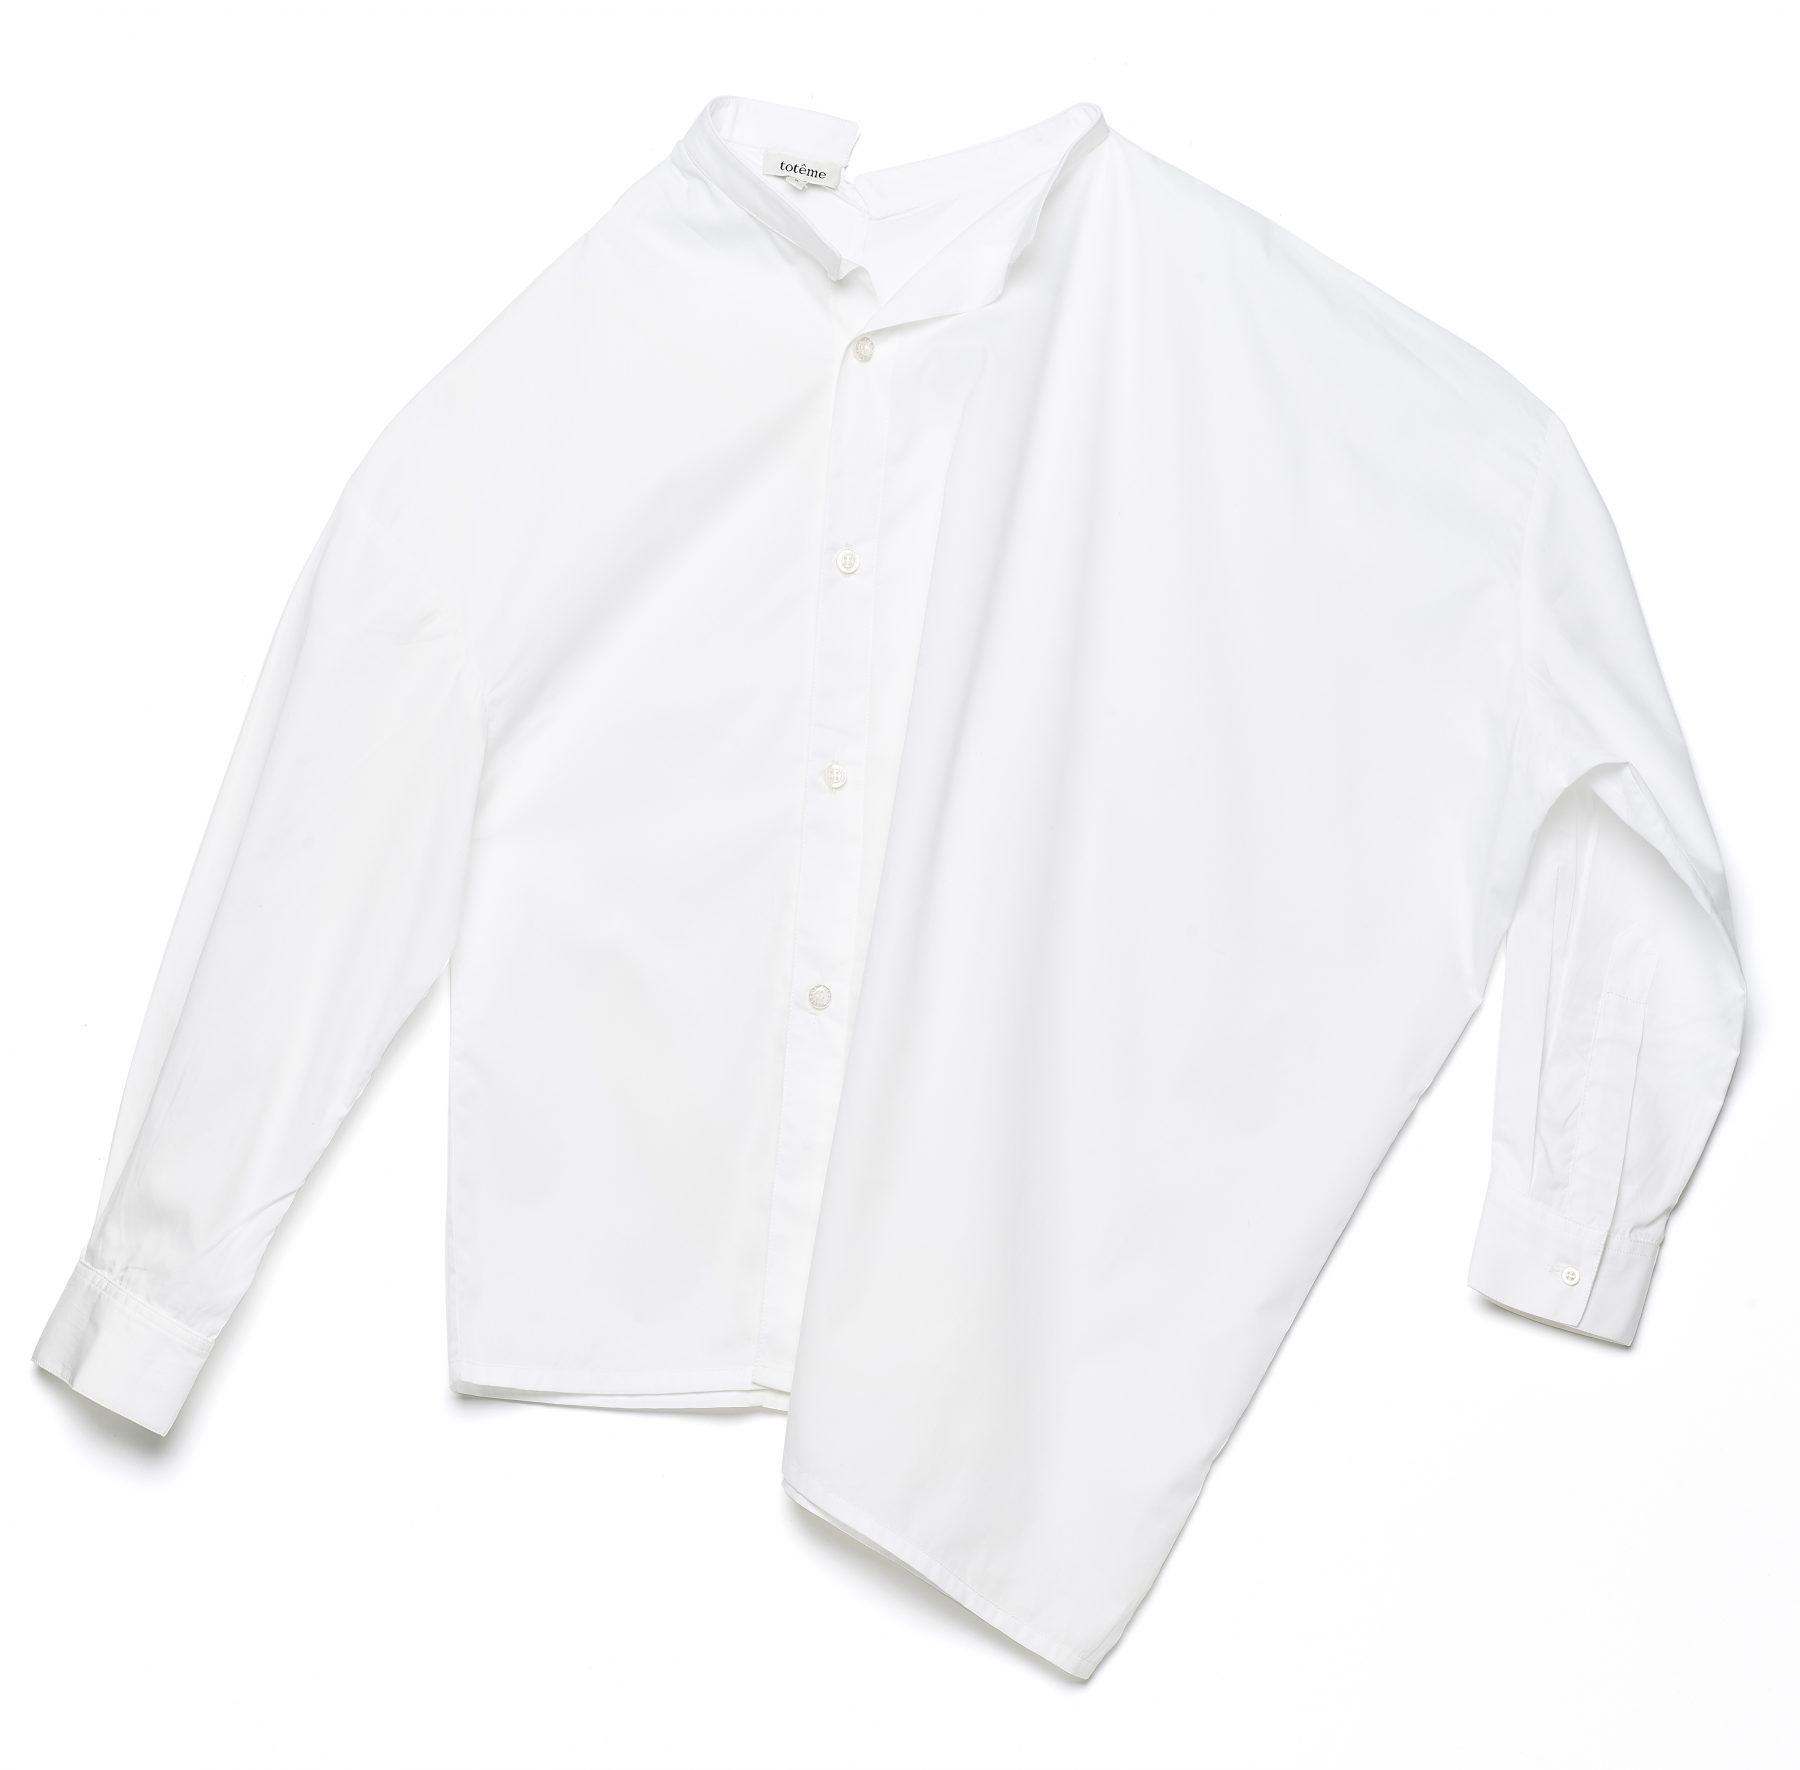 noma-shirt-white-1800x1770.jpg